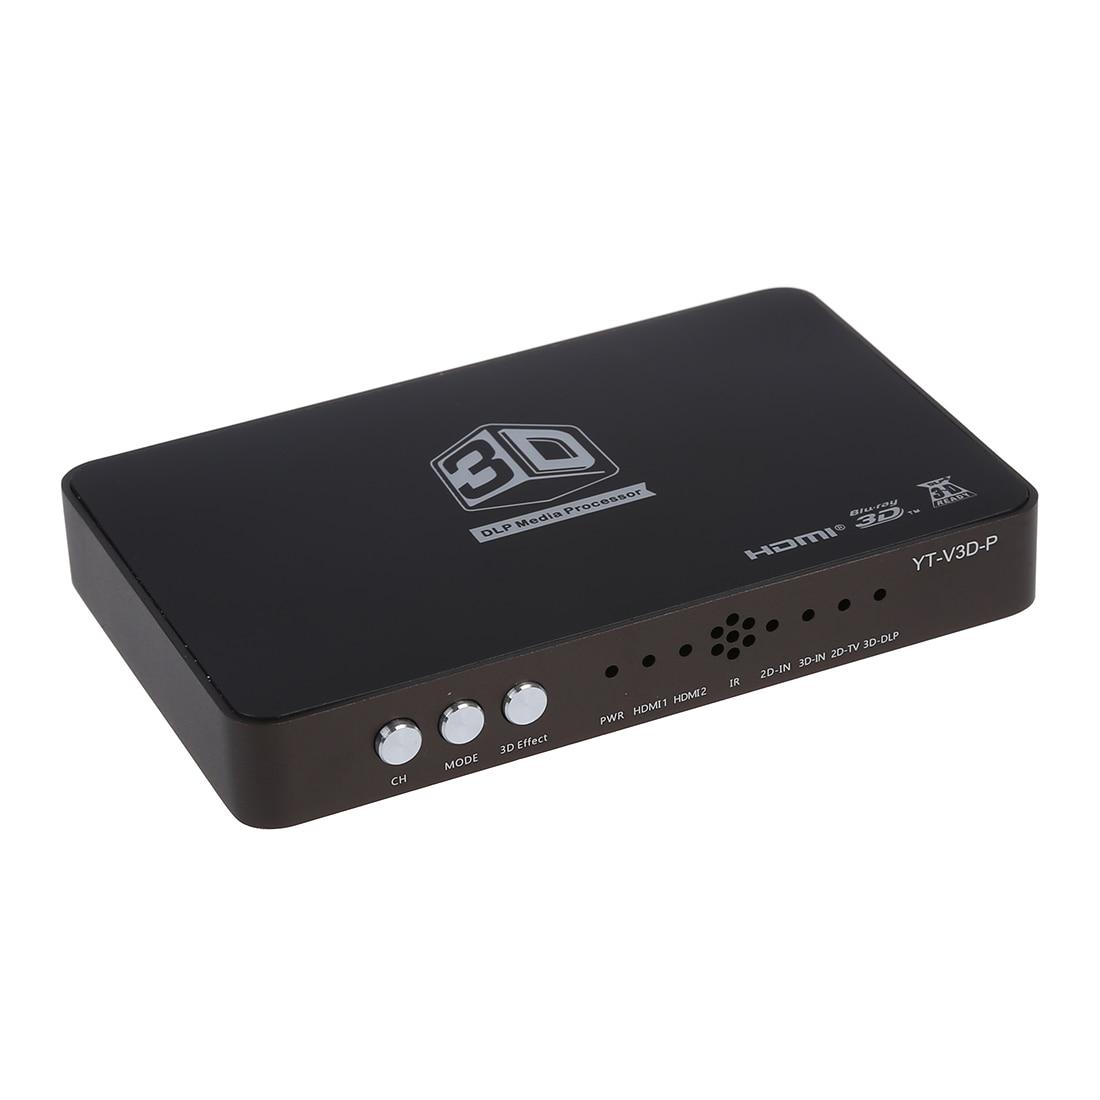 Youting 3d DLP Converter 2x1 Hdmi 1.4 for 120hz 3d Ready DLP Projector Black